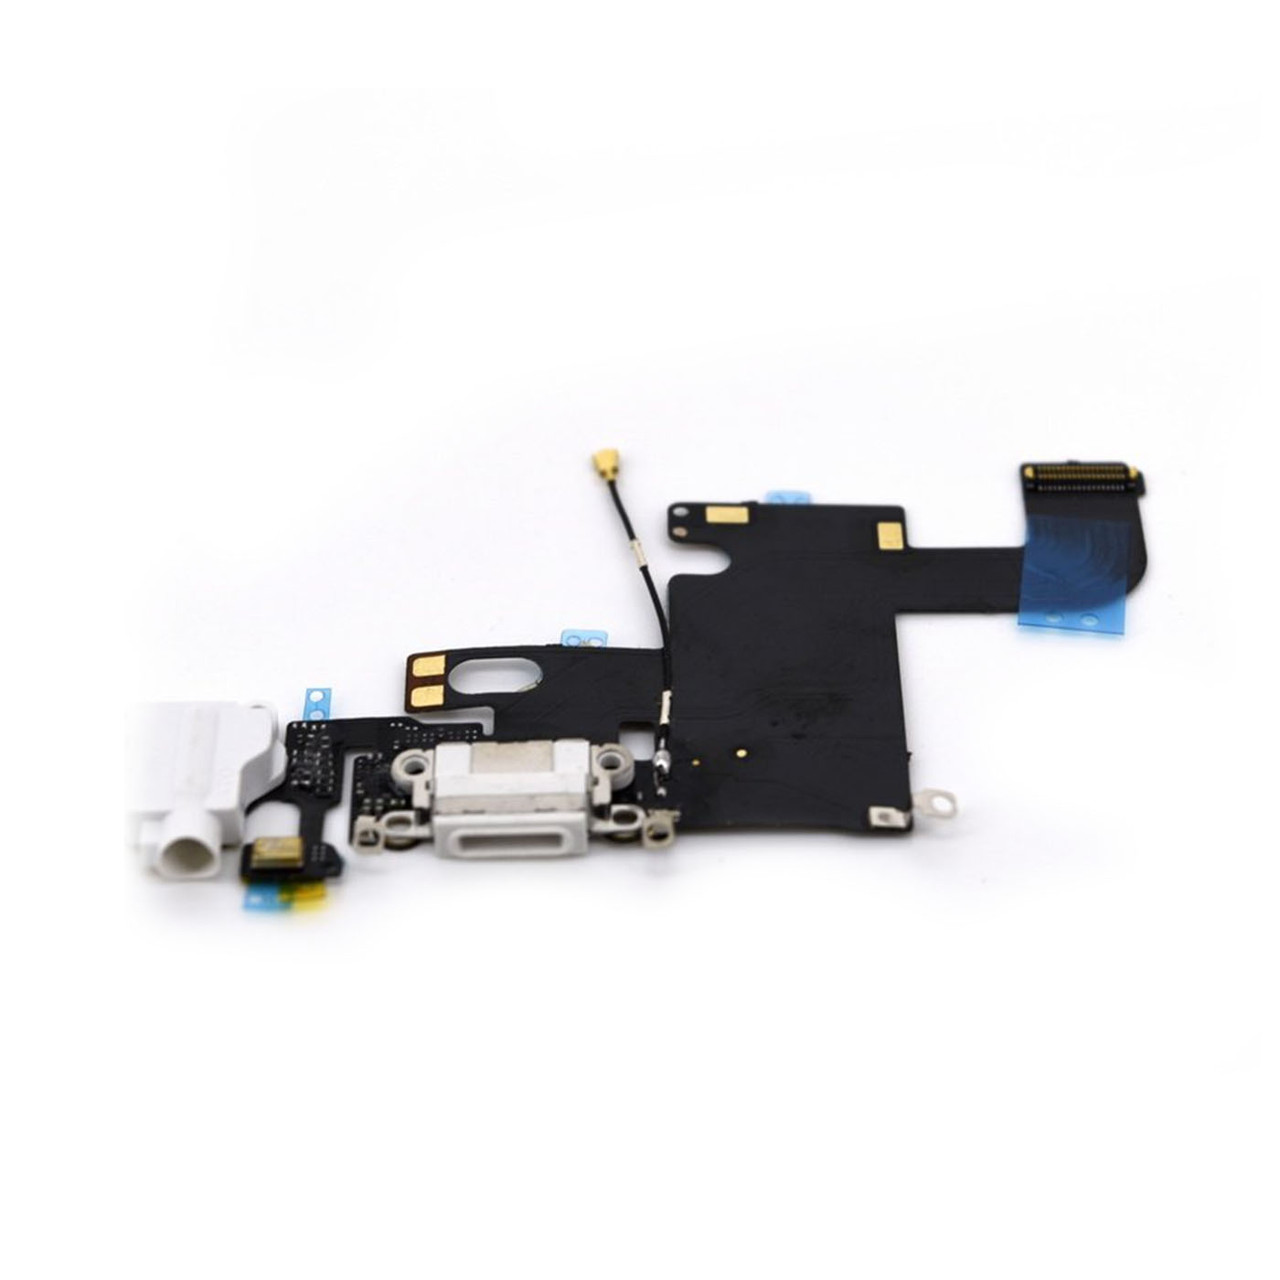 Шлейф Apple iPhone 6G с коннектором заряда и разъемом гарнитуры White (50)